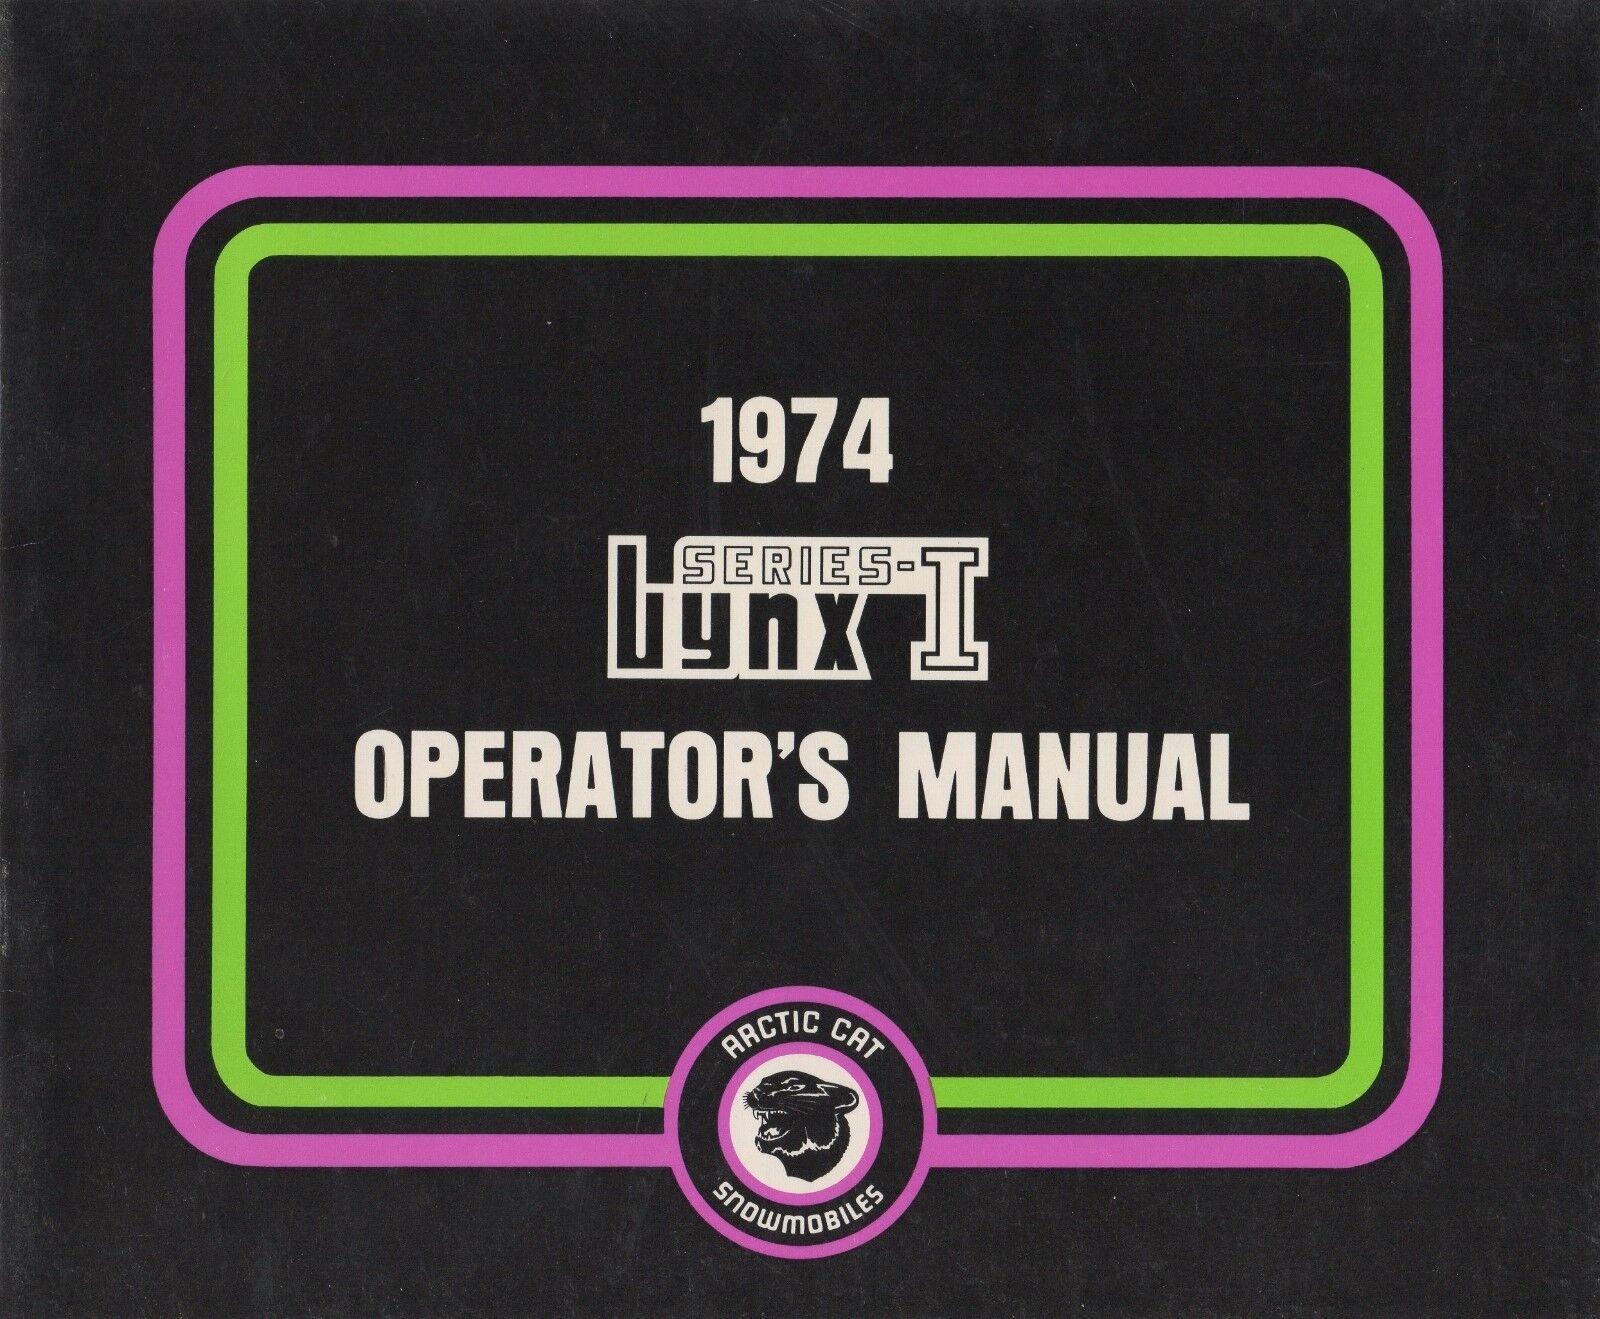 hight resolution of polaris 440 wiring diagram 1974 cat snowmobile lynx series operator u0027s manual p n 2254 026 166polaris 440 wiring